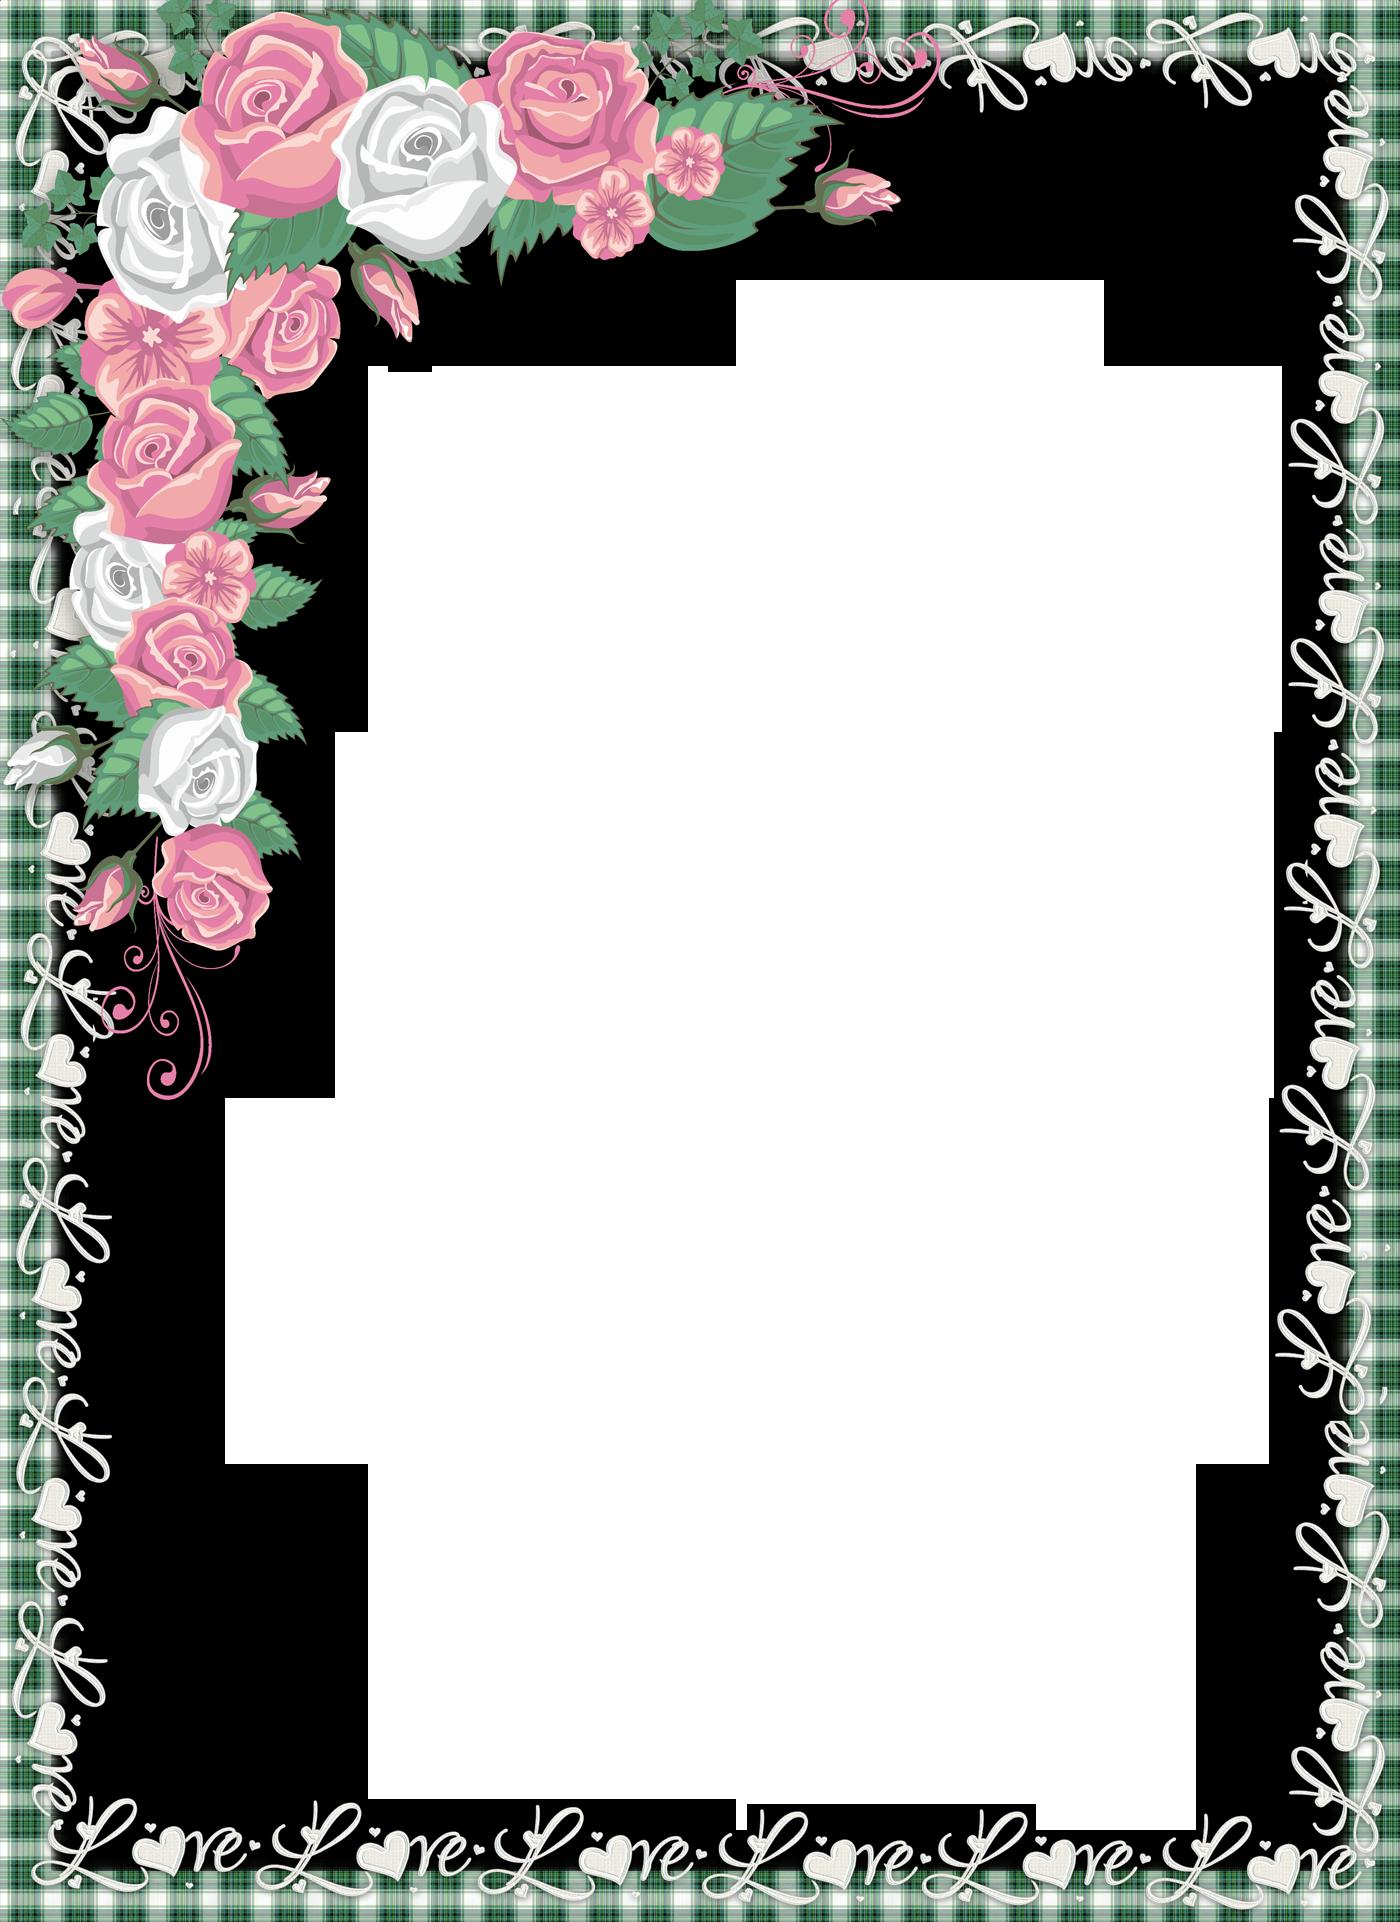 Love png transparent frame with roses floral pinterest for Decoracion de paginas